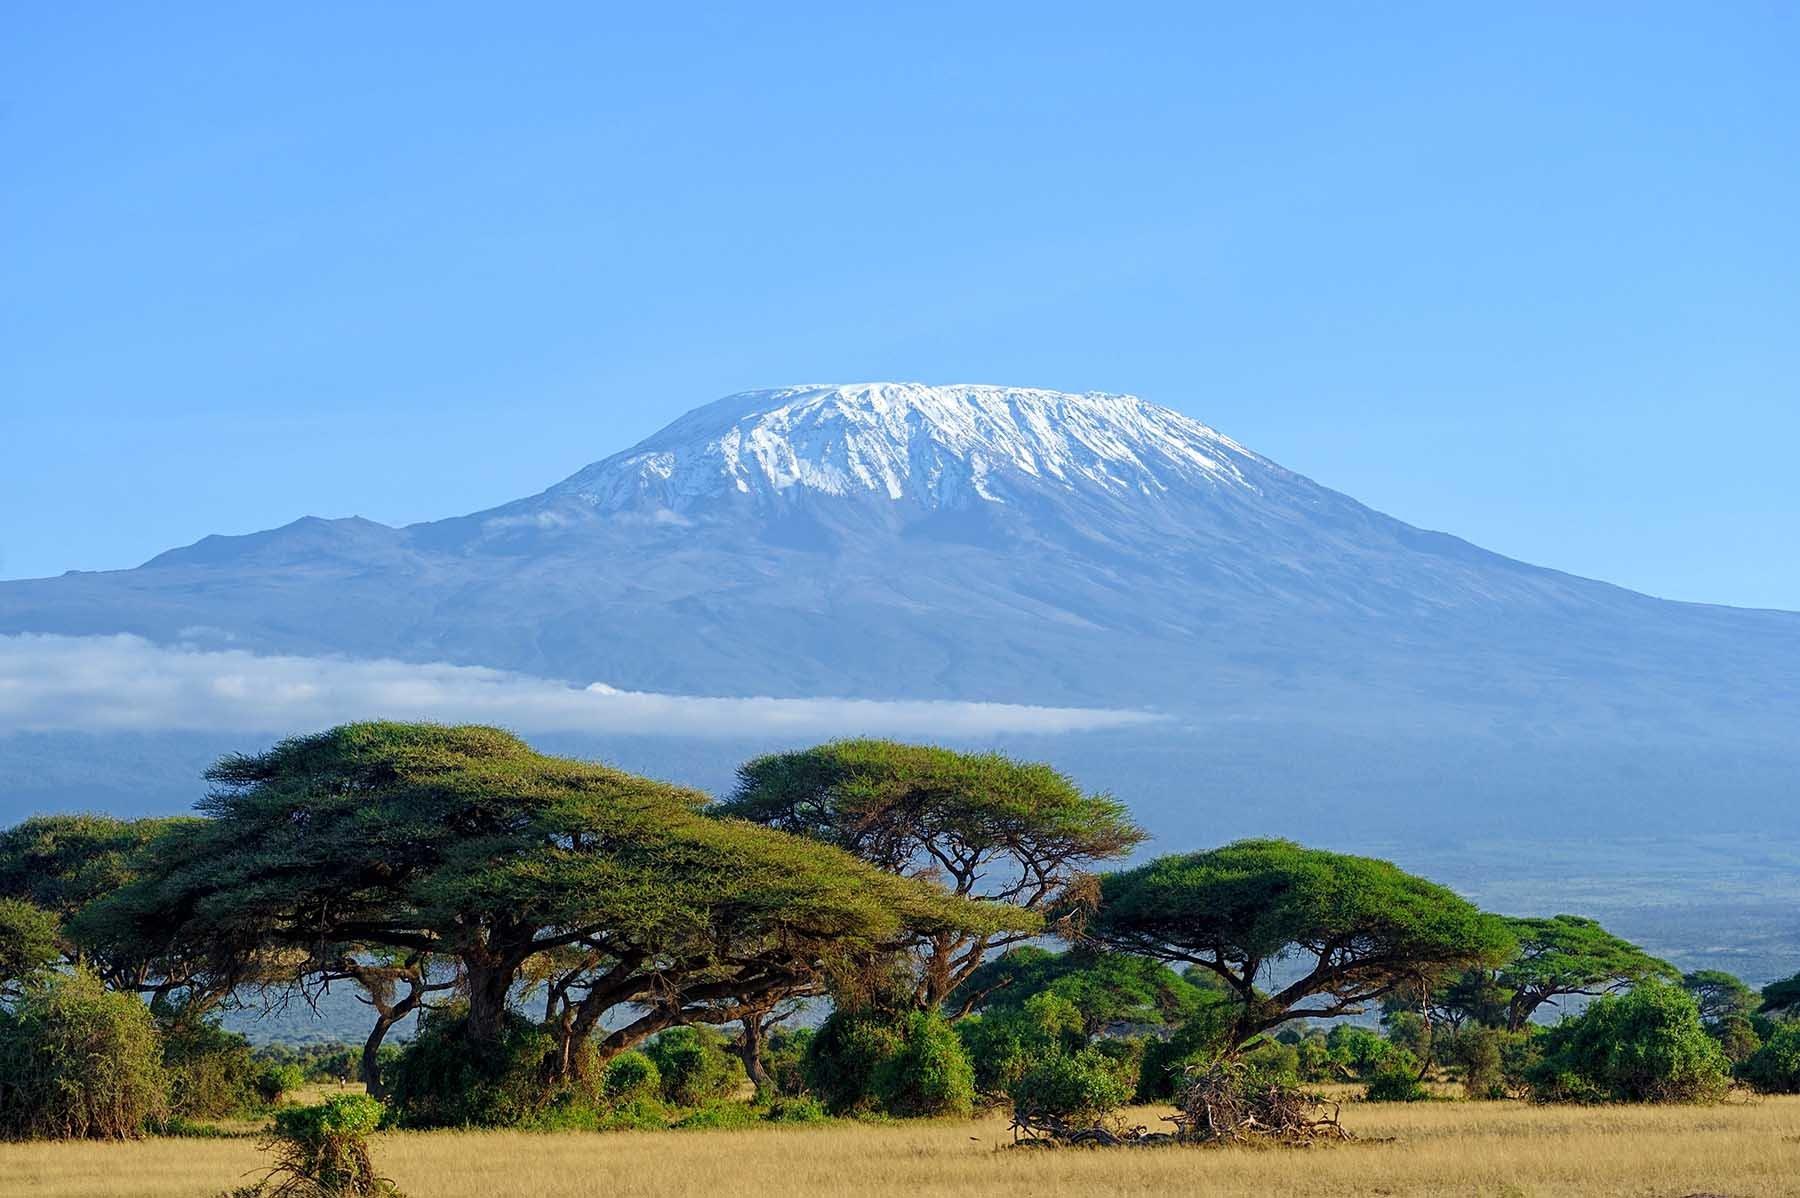 Kilimanjaro Travel Insurance